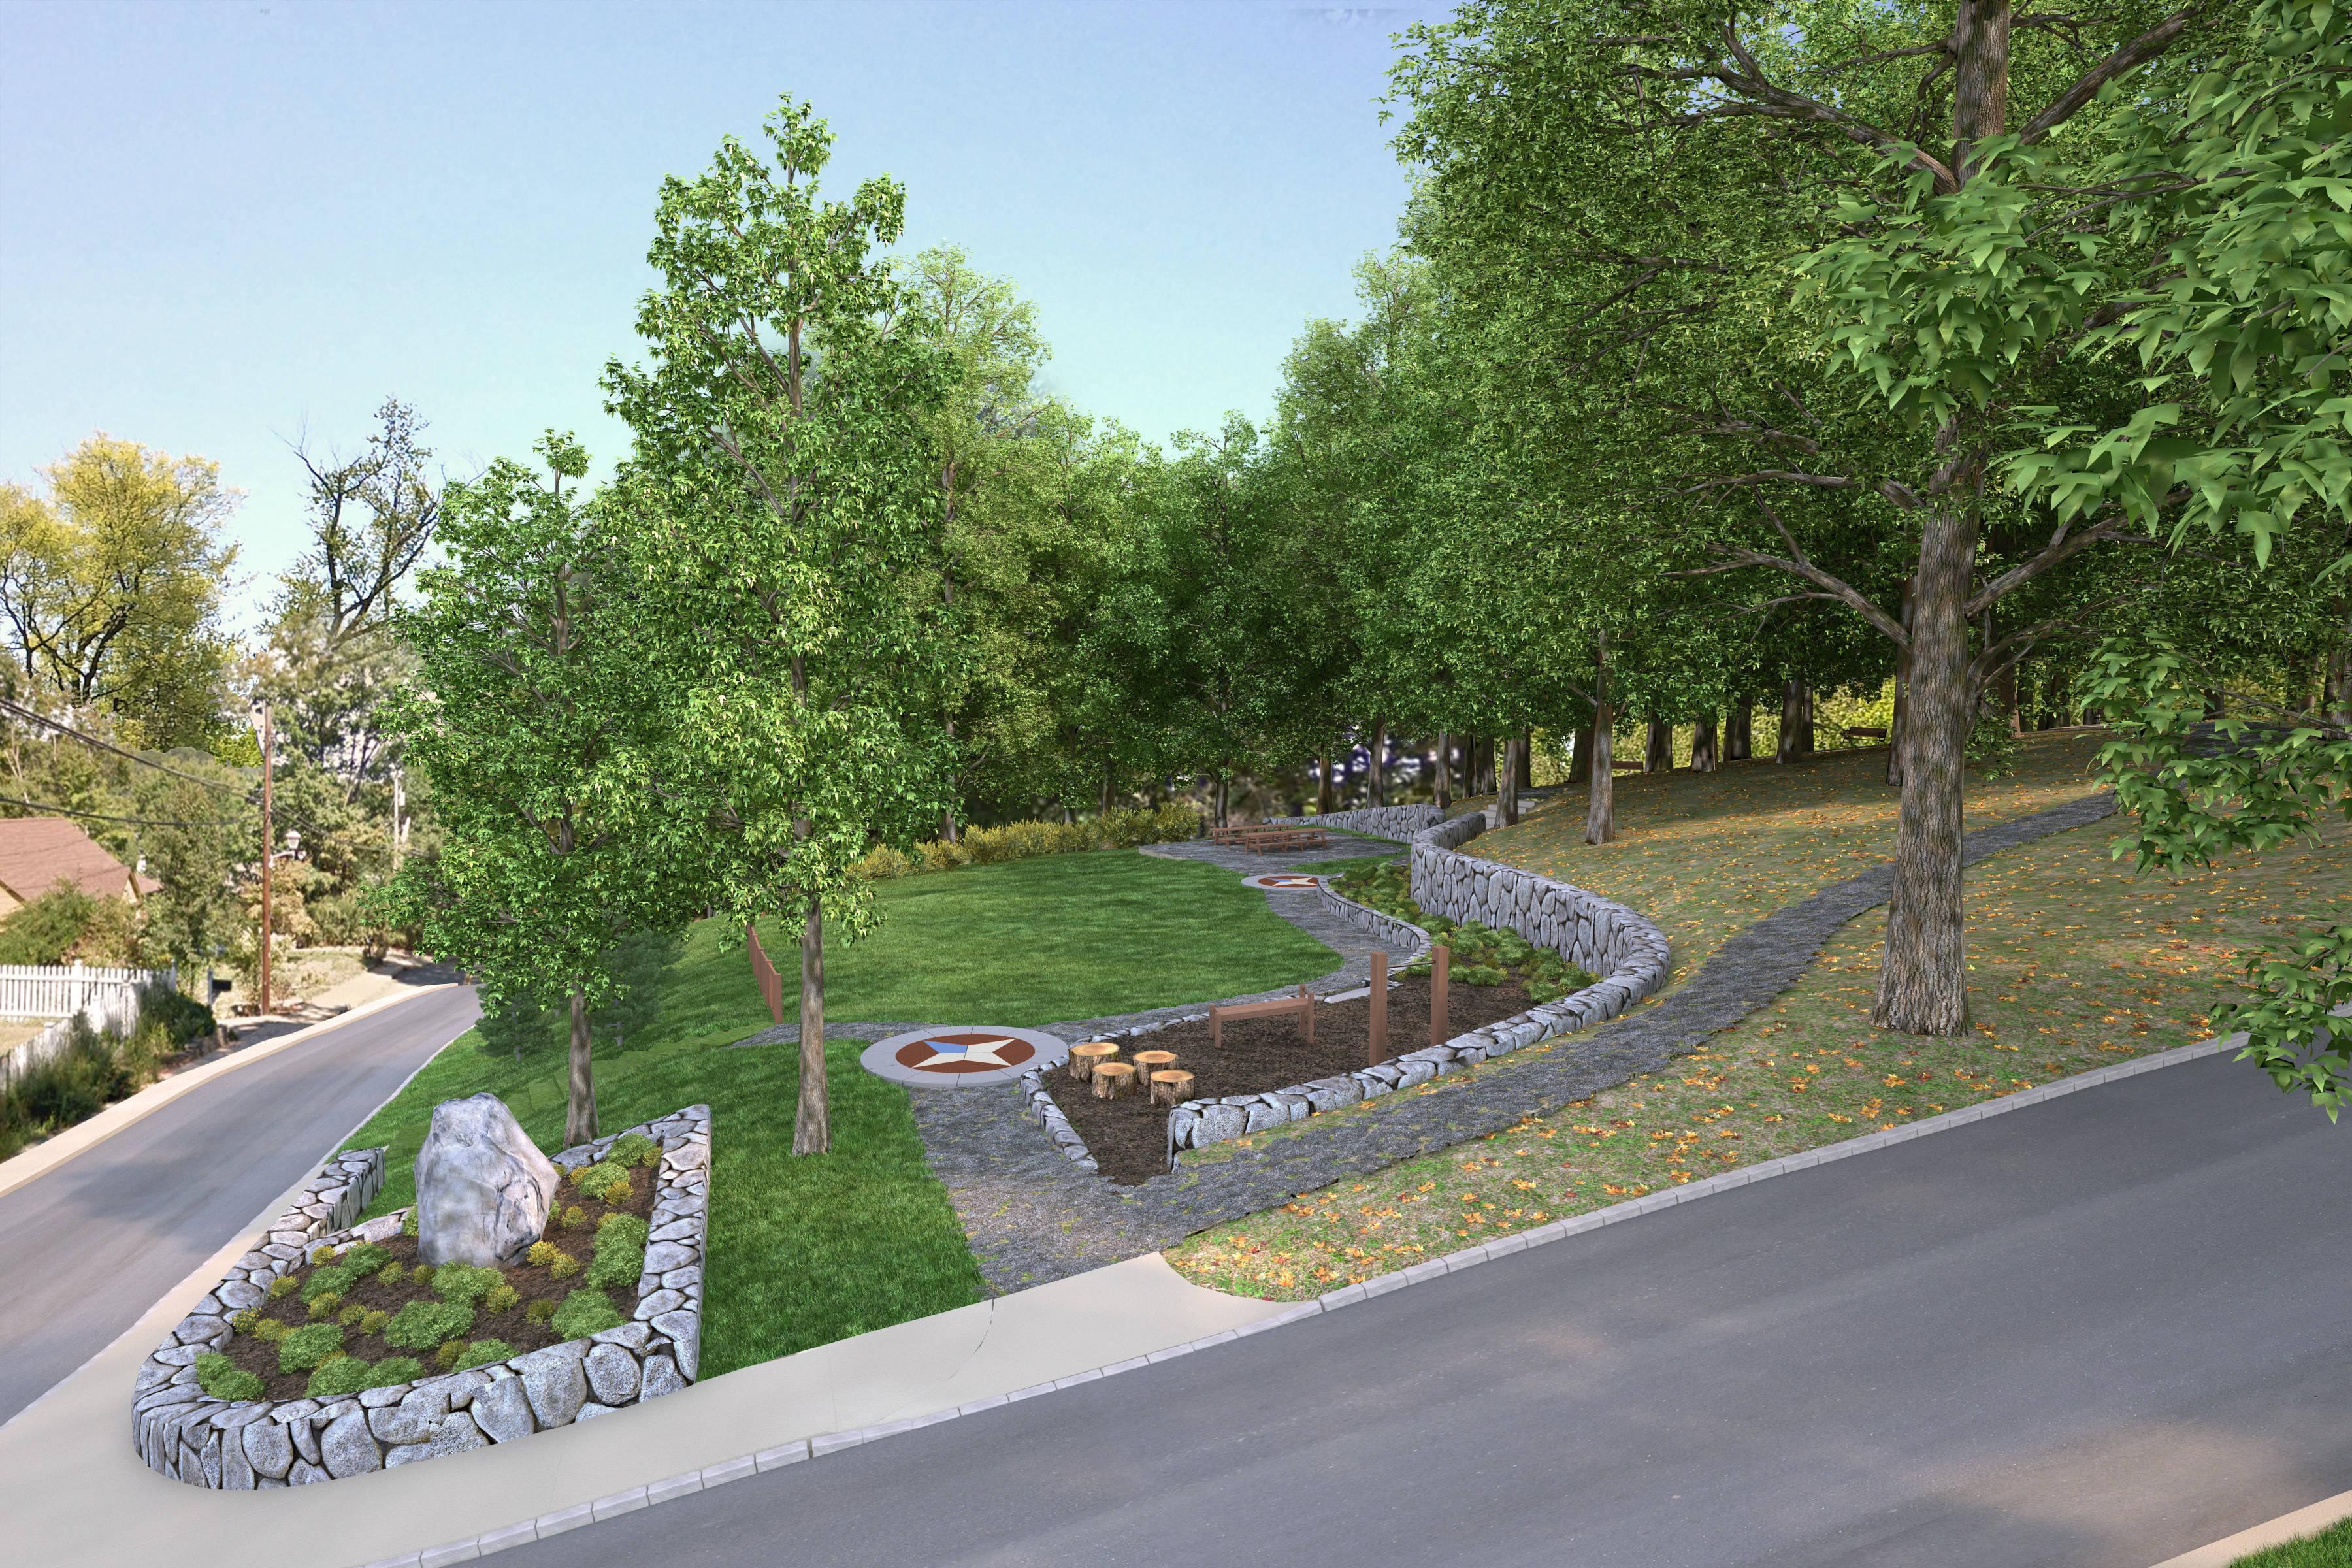 morristown s kleitman woods park to open late summer morristown